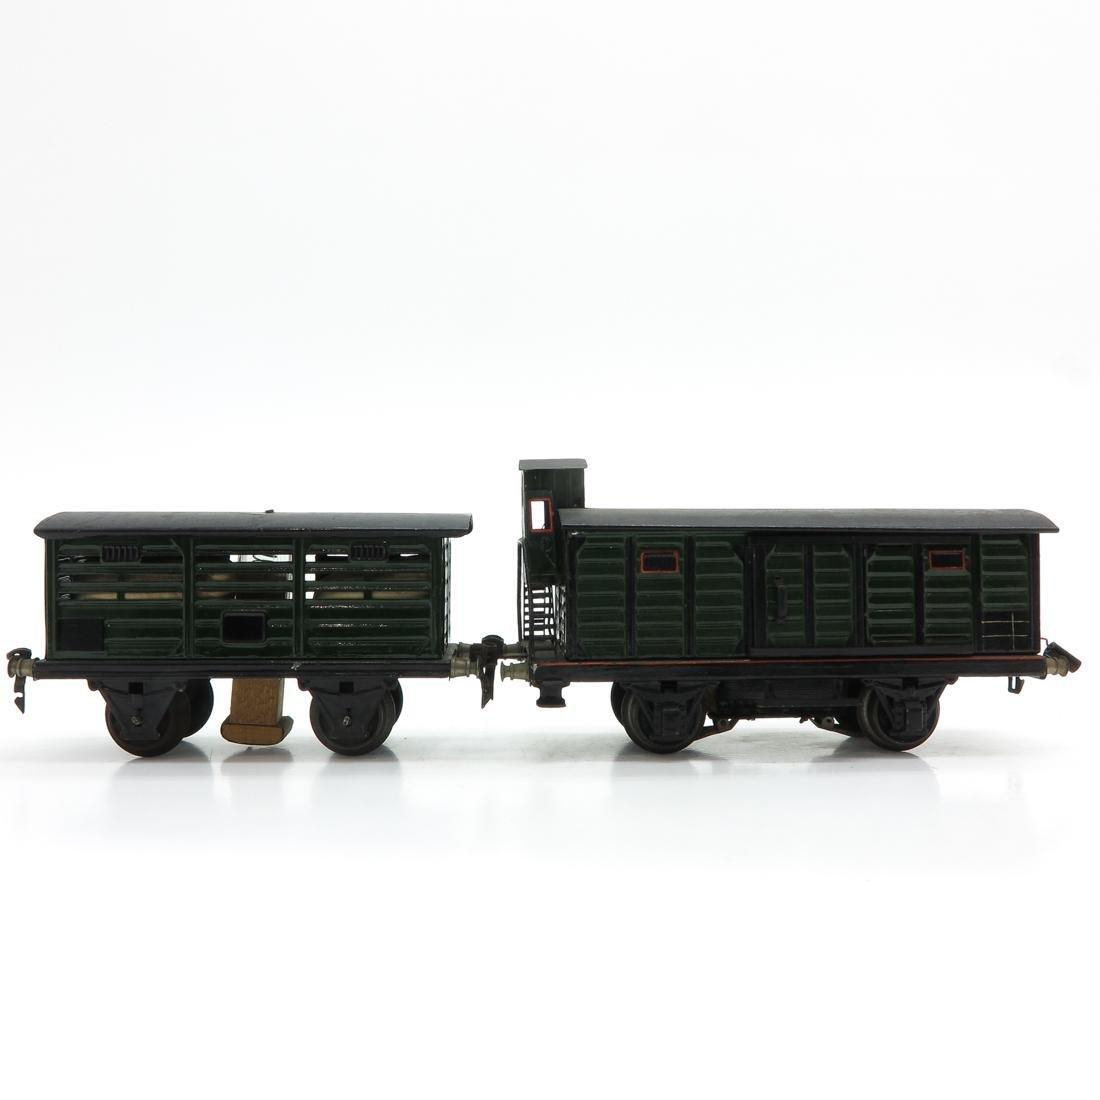 Lot of 2 Vintage Marklin Train Cars - 3